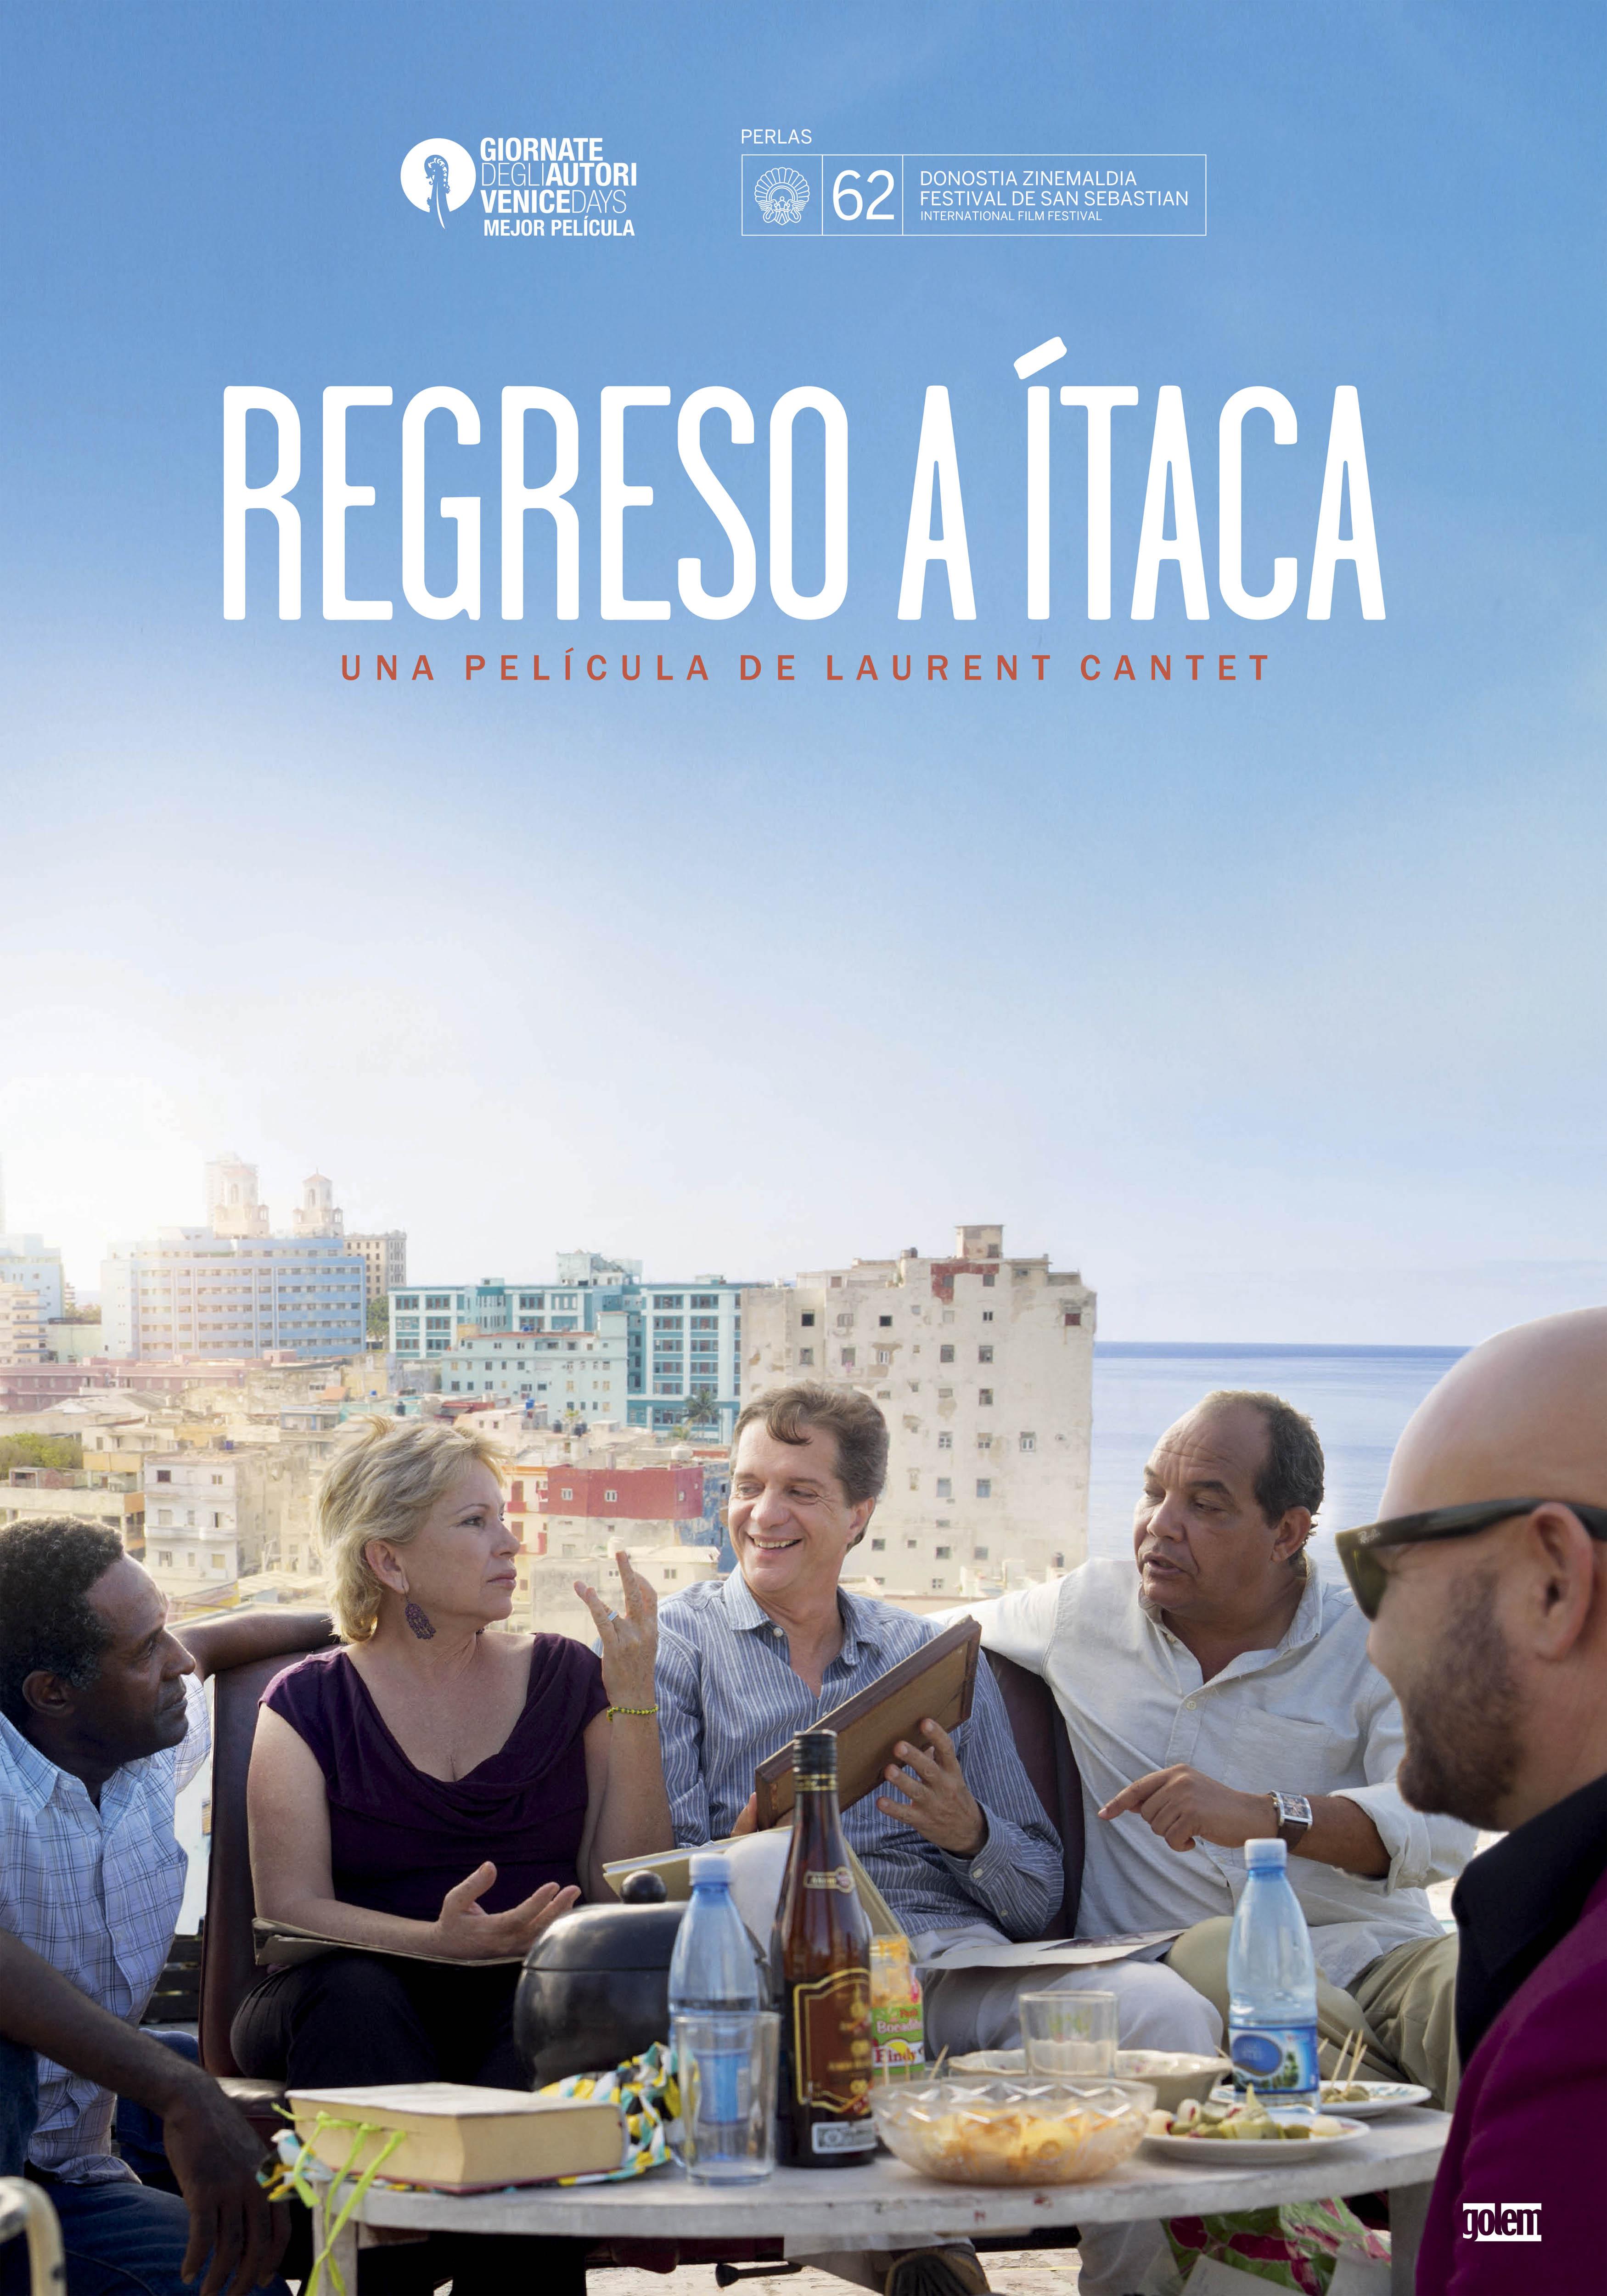 Regreso_a_taca-716205466-large